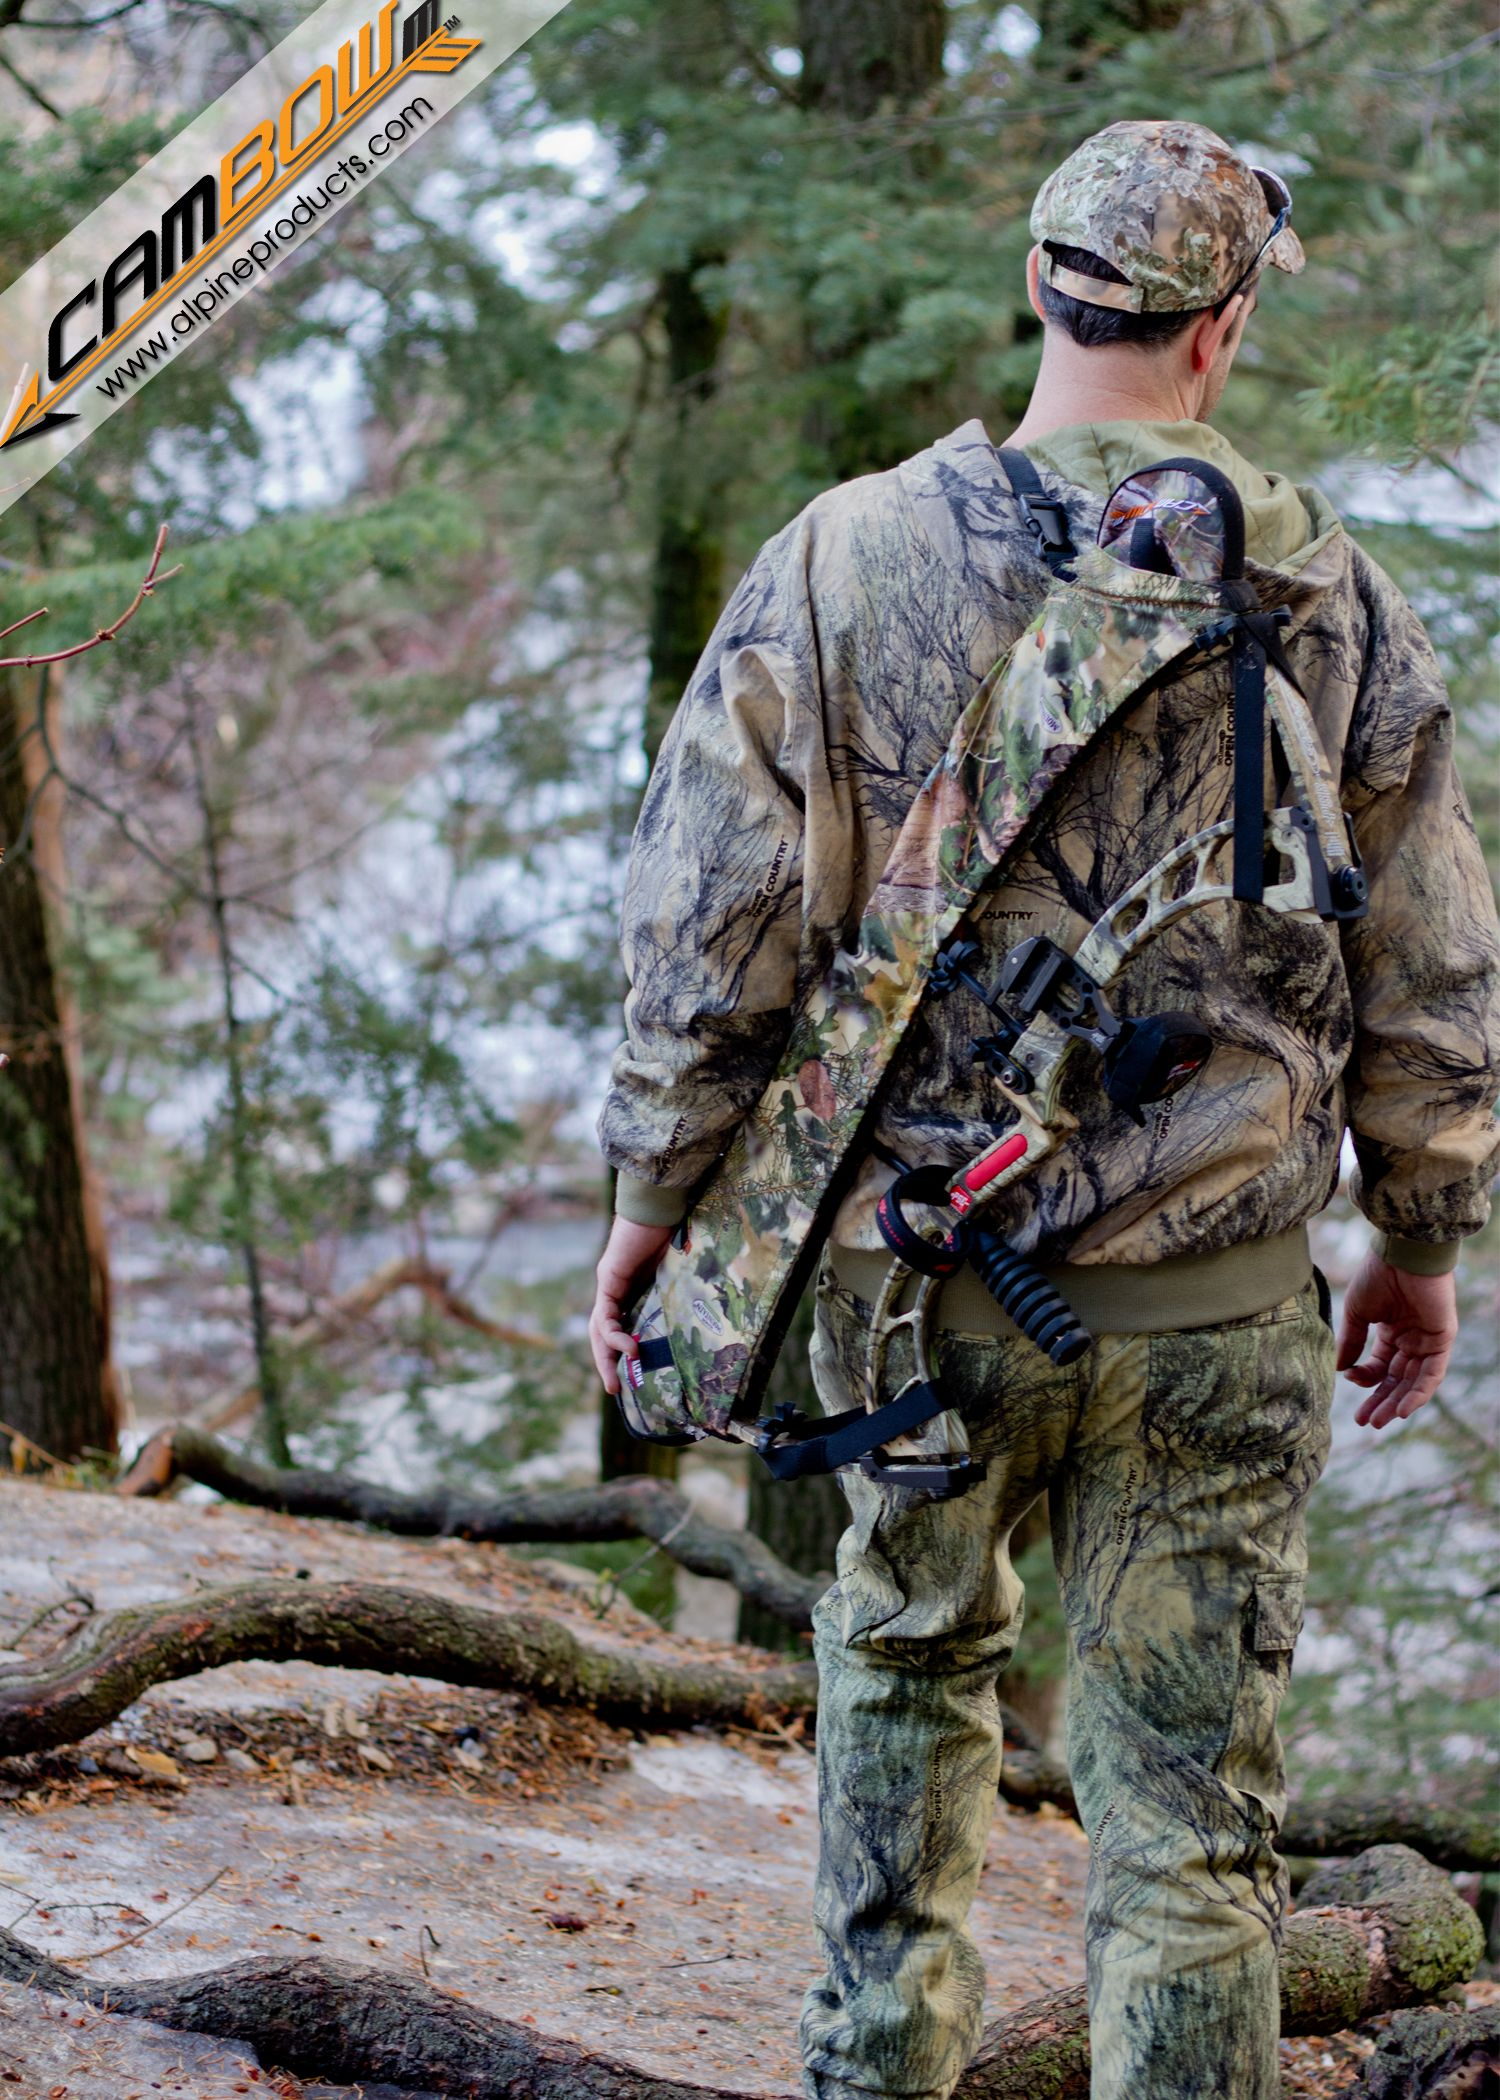 Heavy Hauler Outdoor Quik Detach Bow Sling Compound Bow Shoulder Realtree Camo